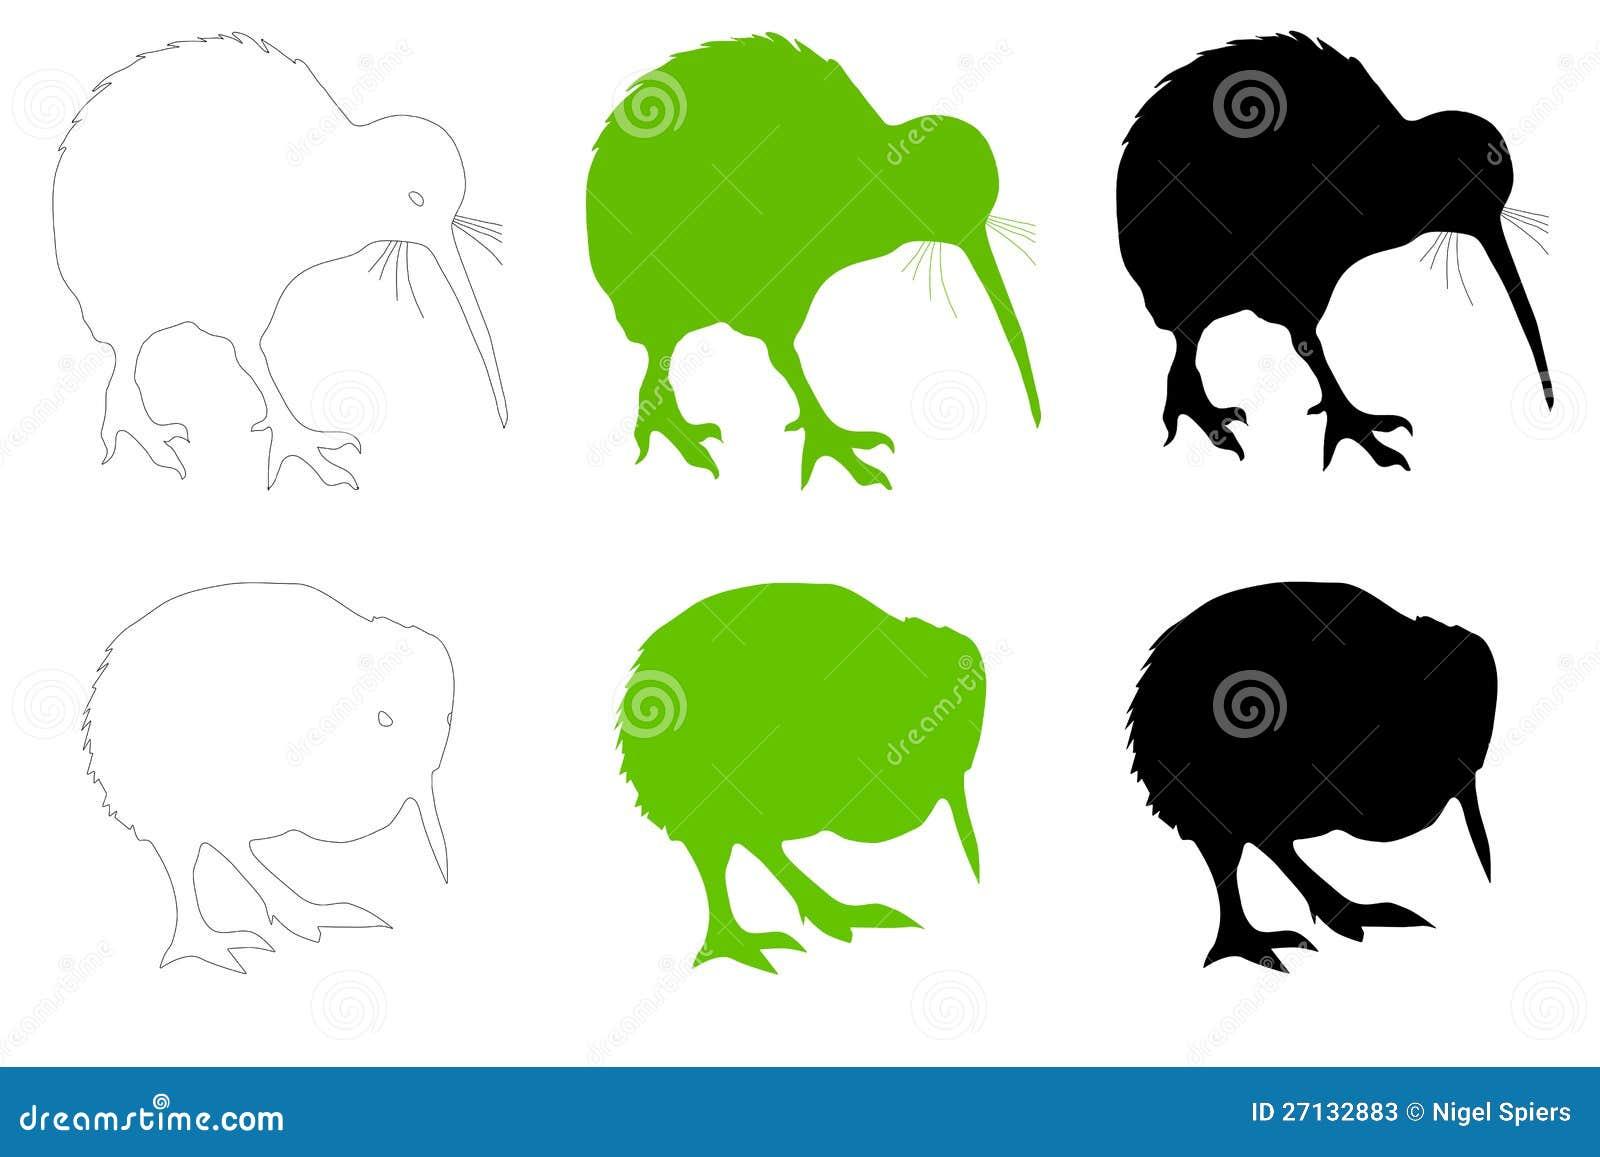 Kiwi Bird Adult Amp Baby Vector Illustration Stock Photos